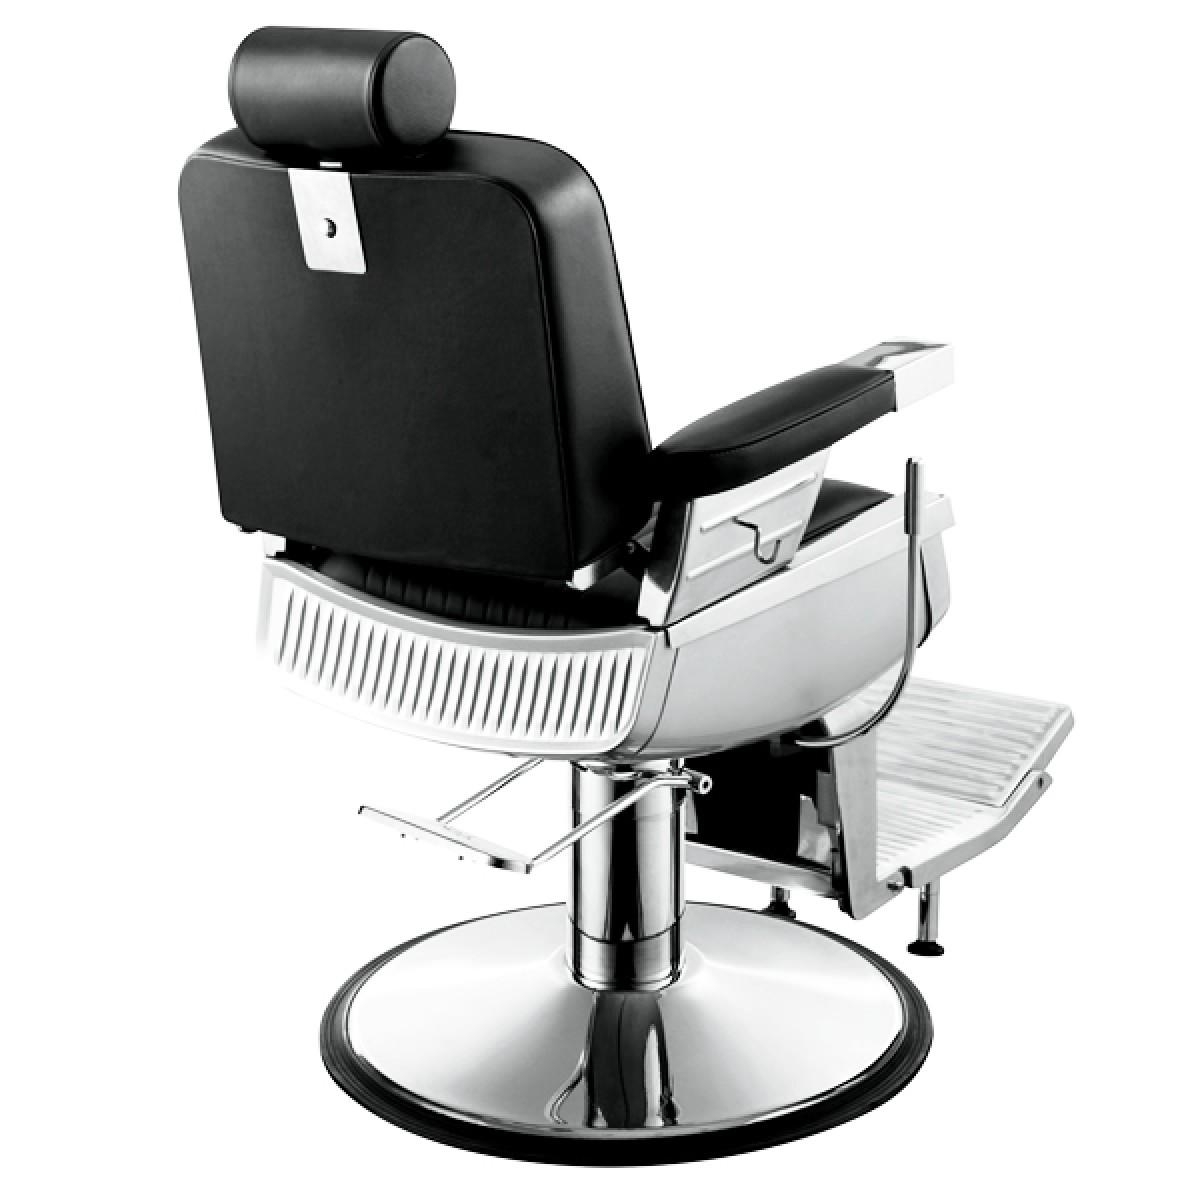 AGS Salon Equipment